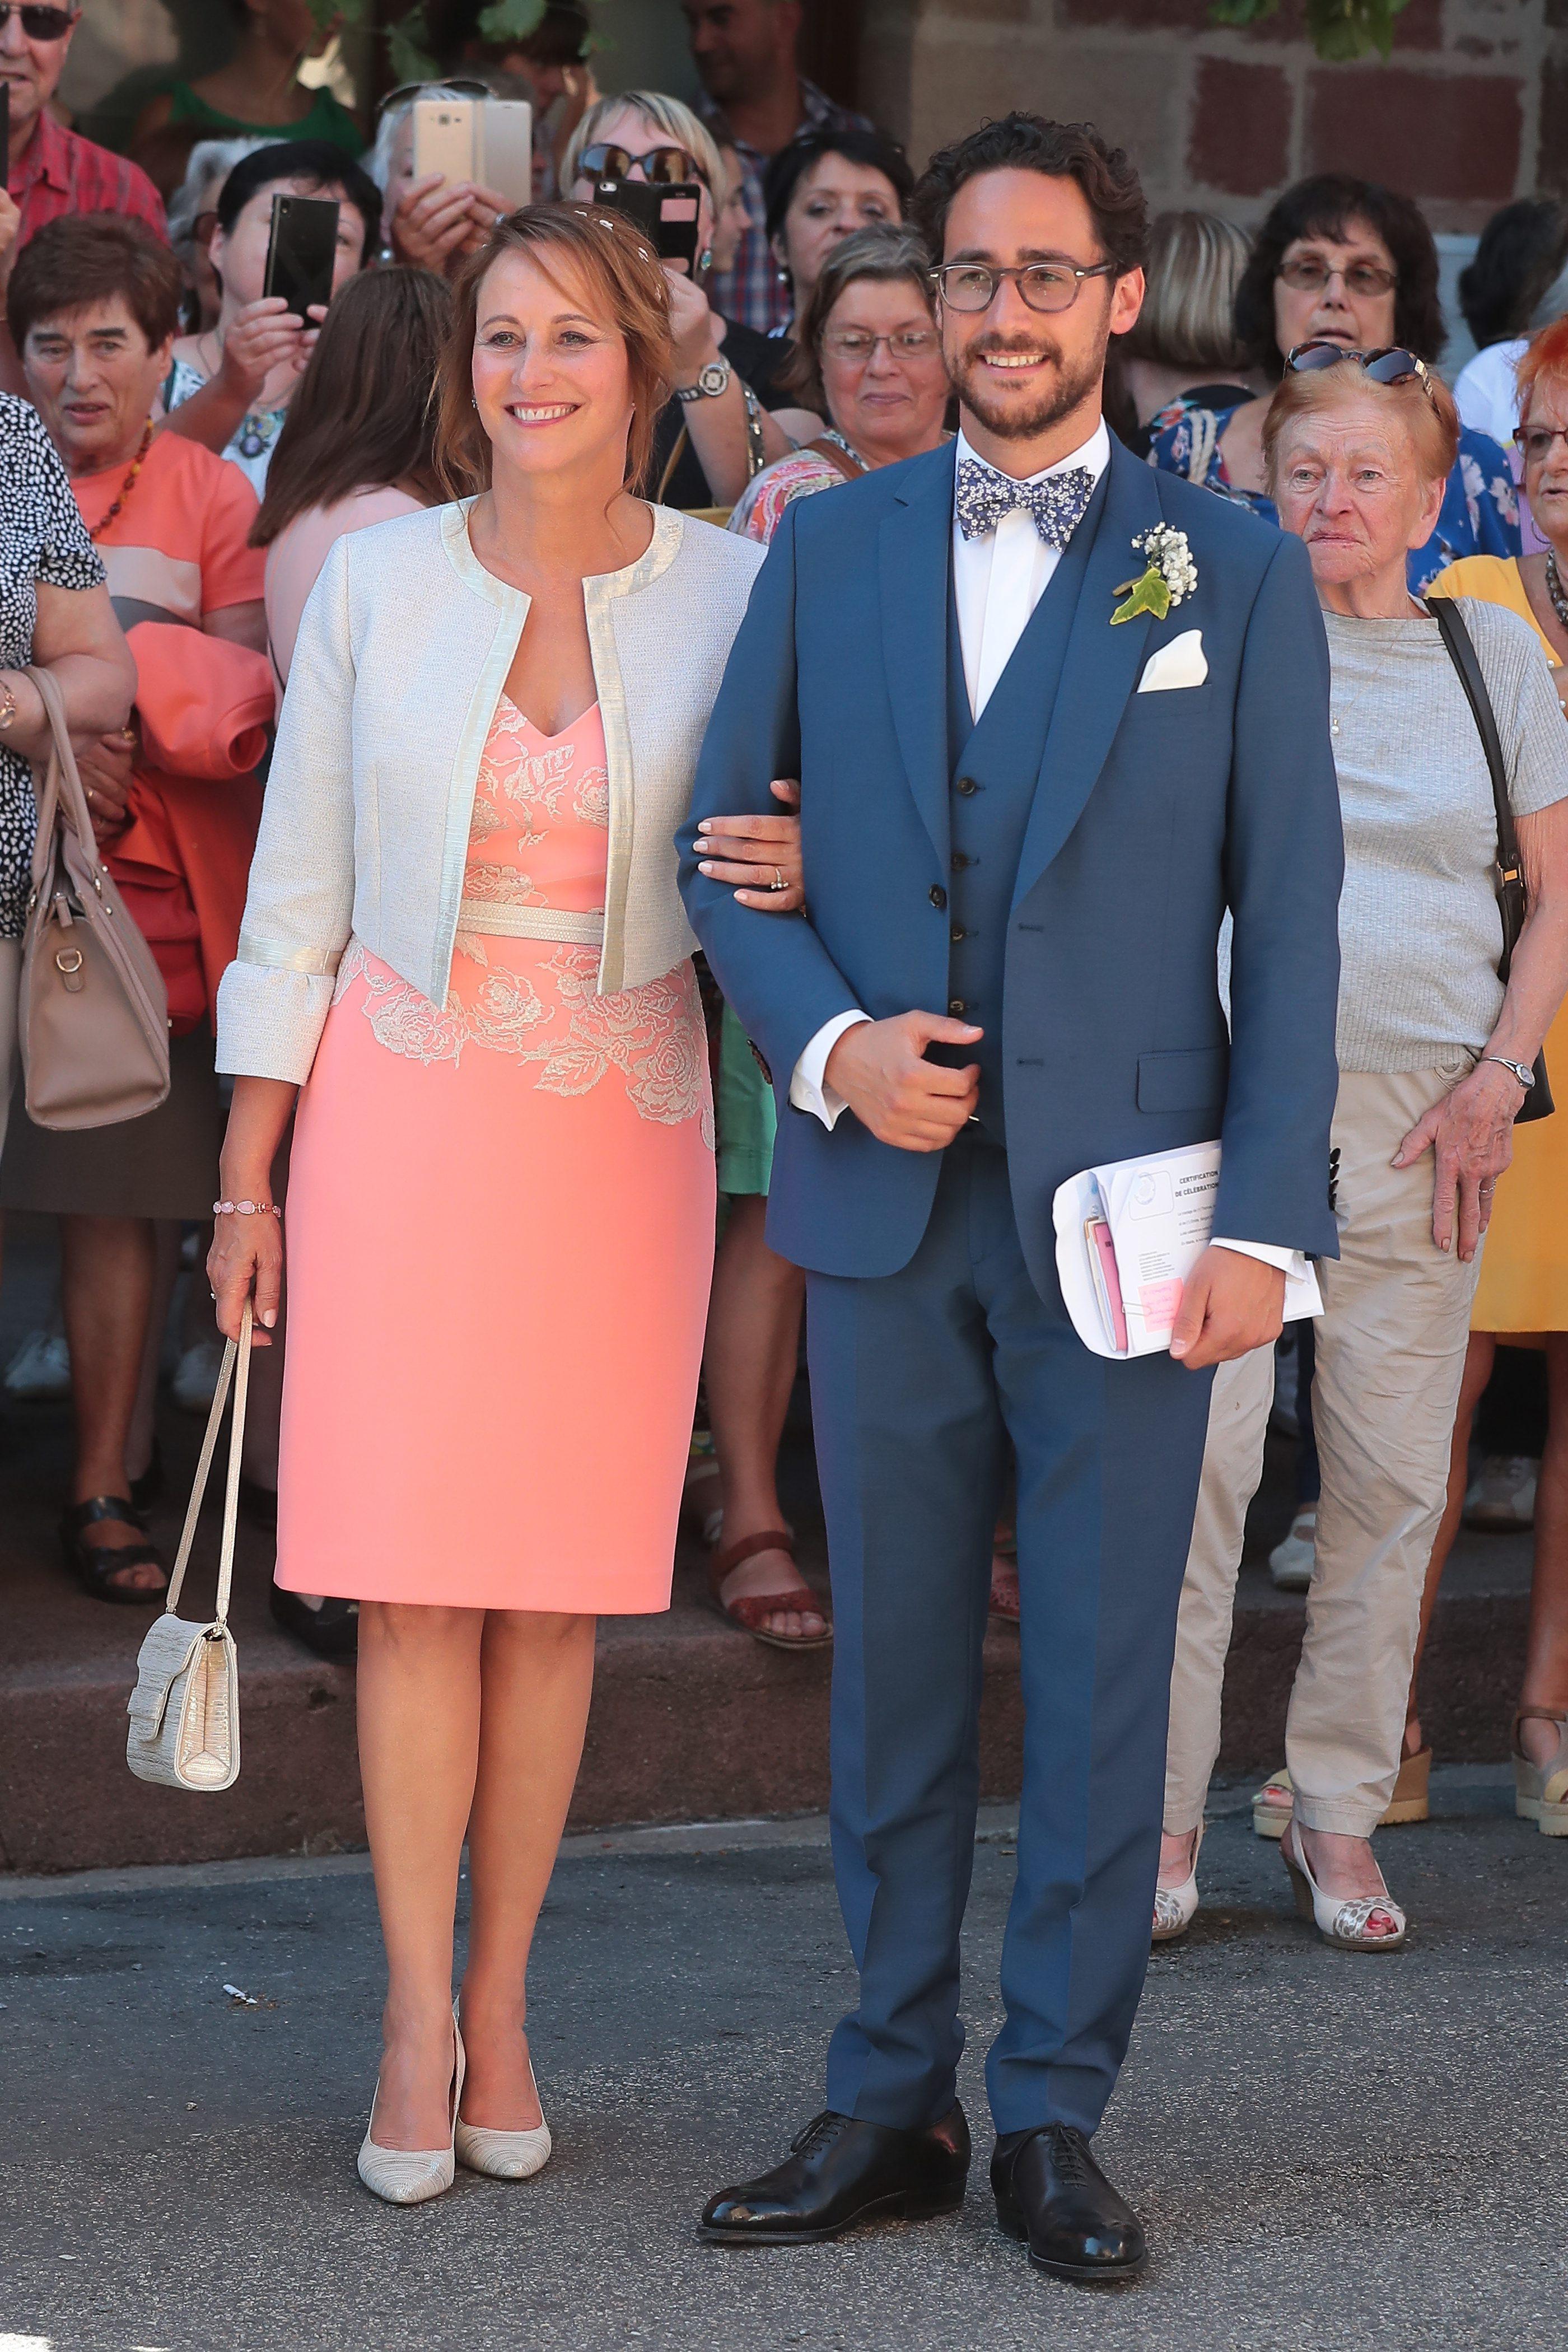 Segolène Royal en la boda de su hijo. (Cordon Press)